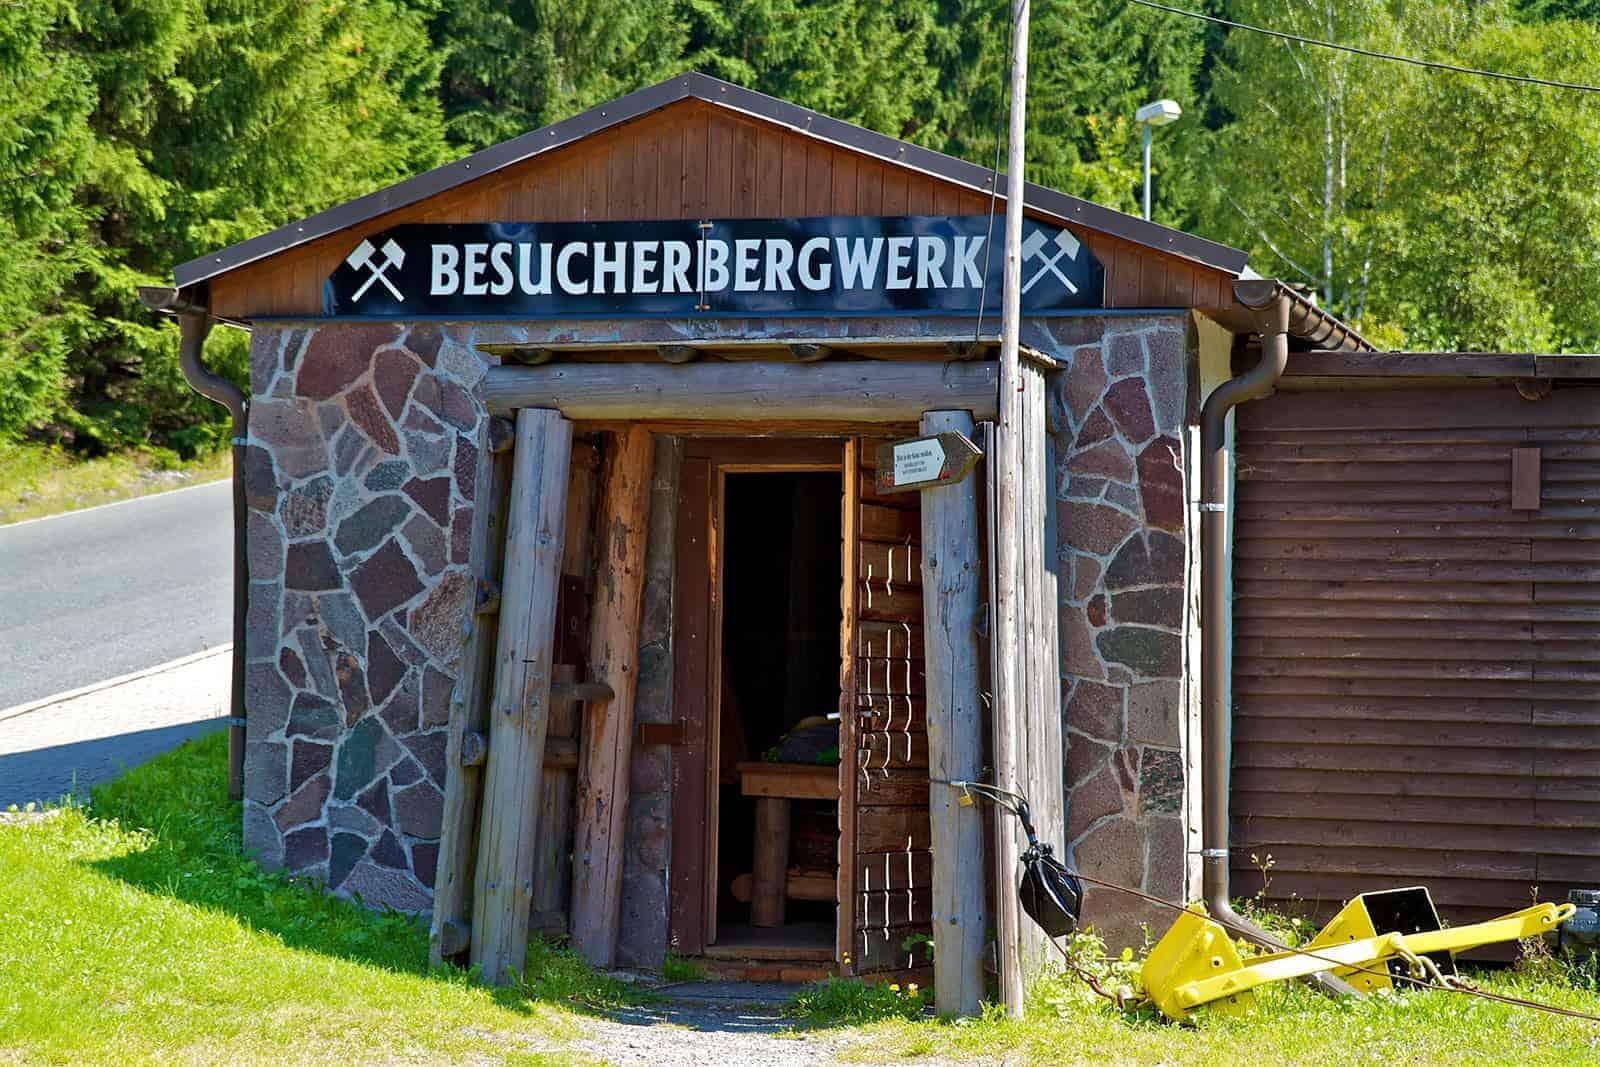 Besucherbergwerk Breitenbrunn